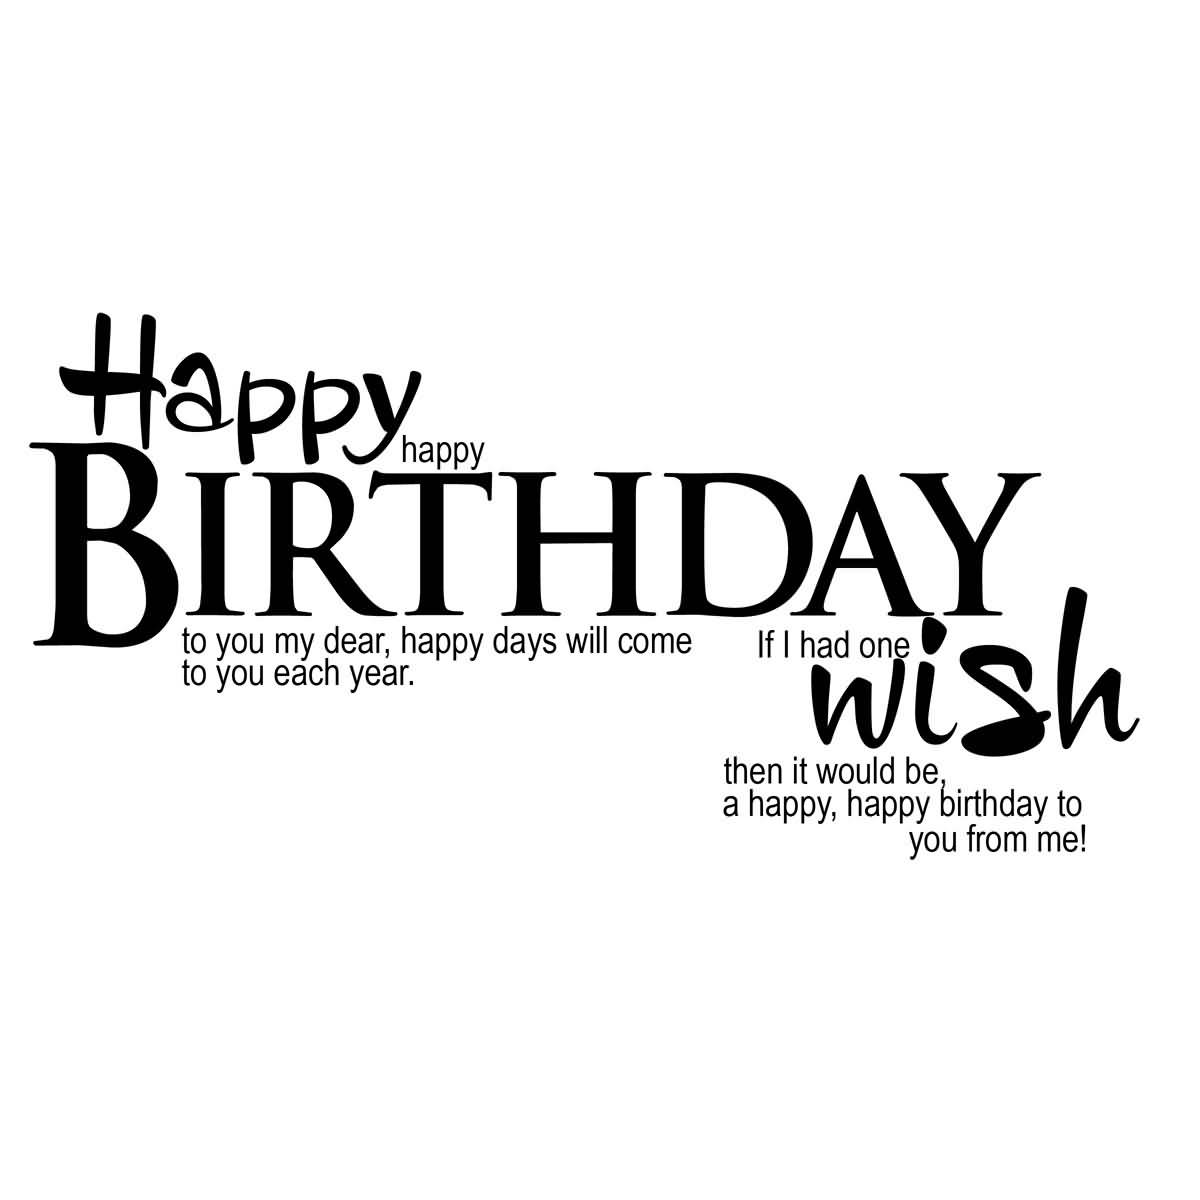 Wishes You Fabulous Birthday Boss